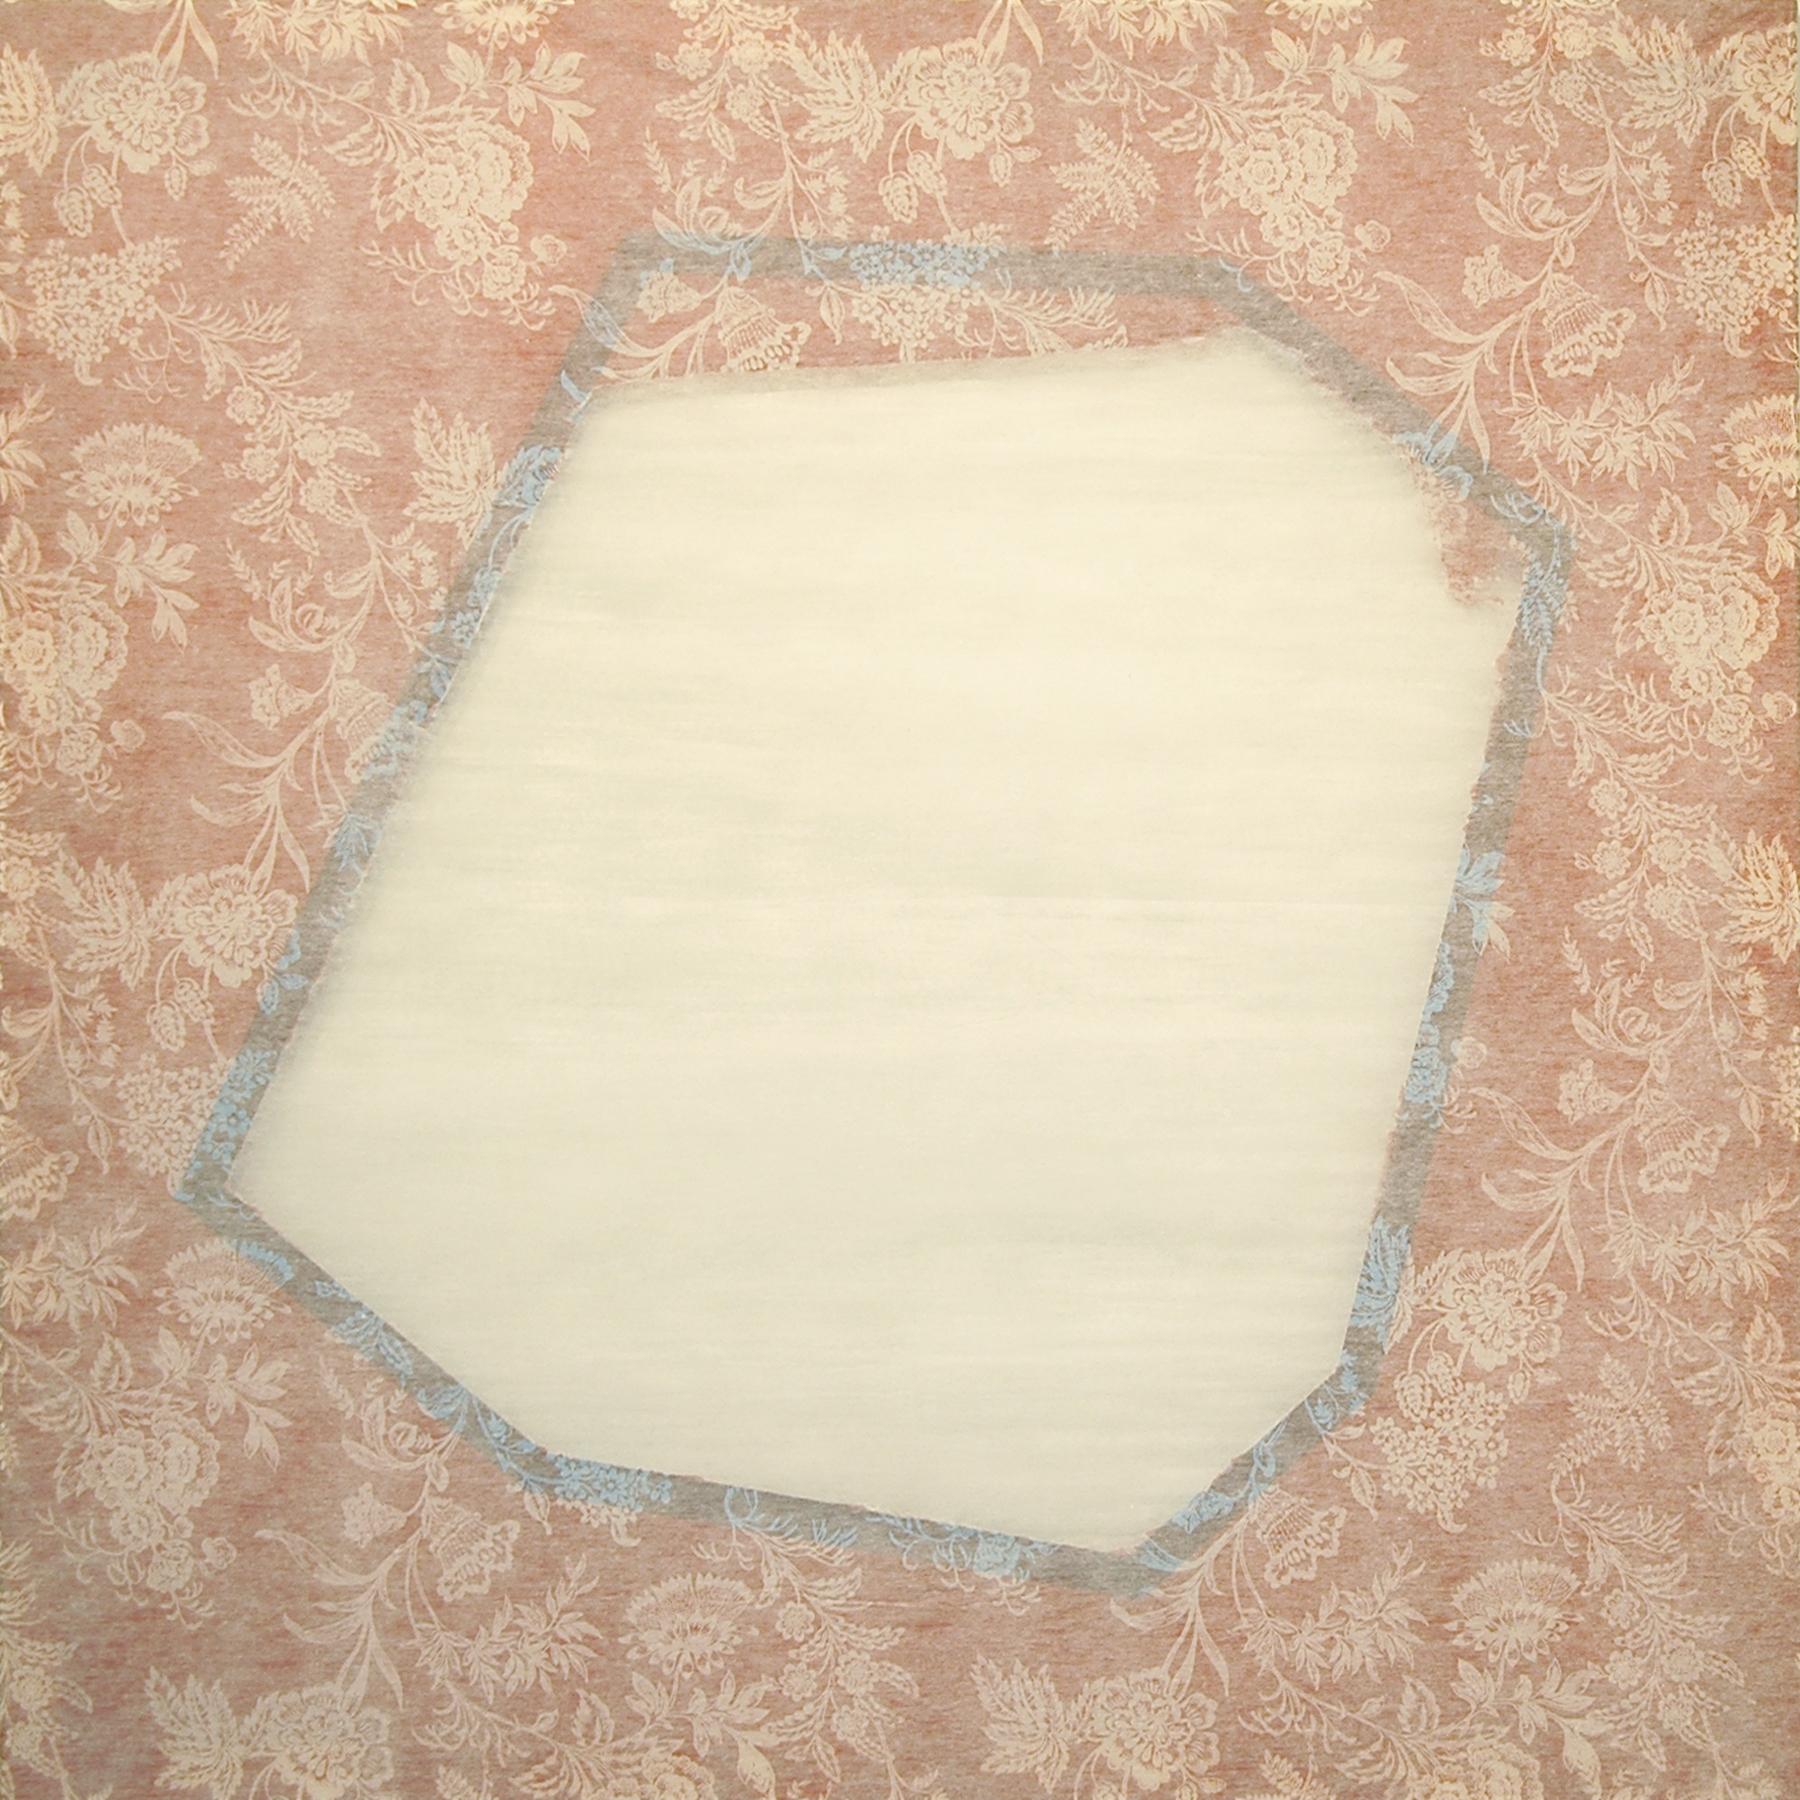 "DERIC CARNER   Melancolia , fleece-backed tablecloth, tape, stretcher bars, 44"" x 44"", 2012"